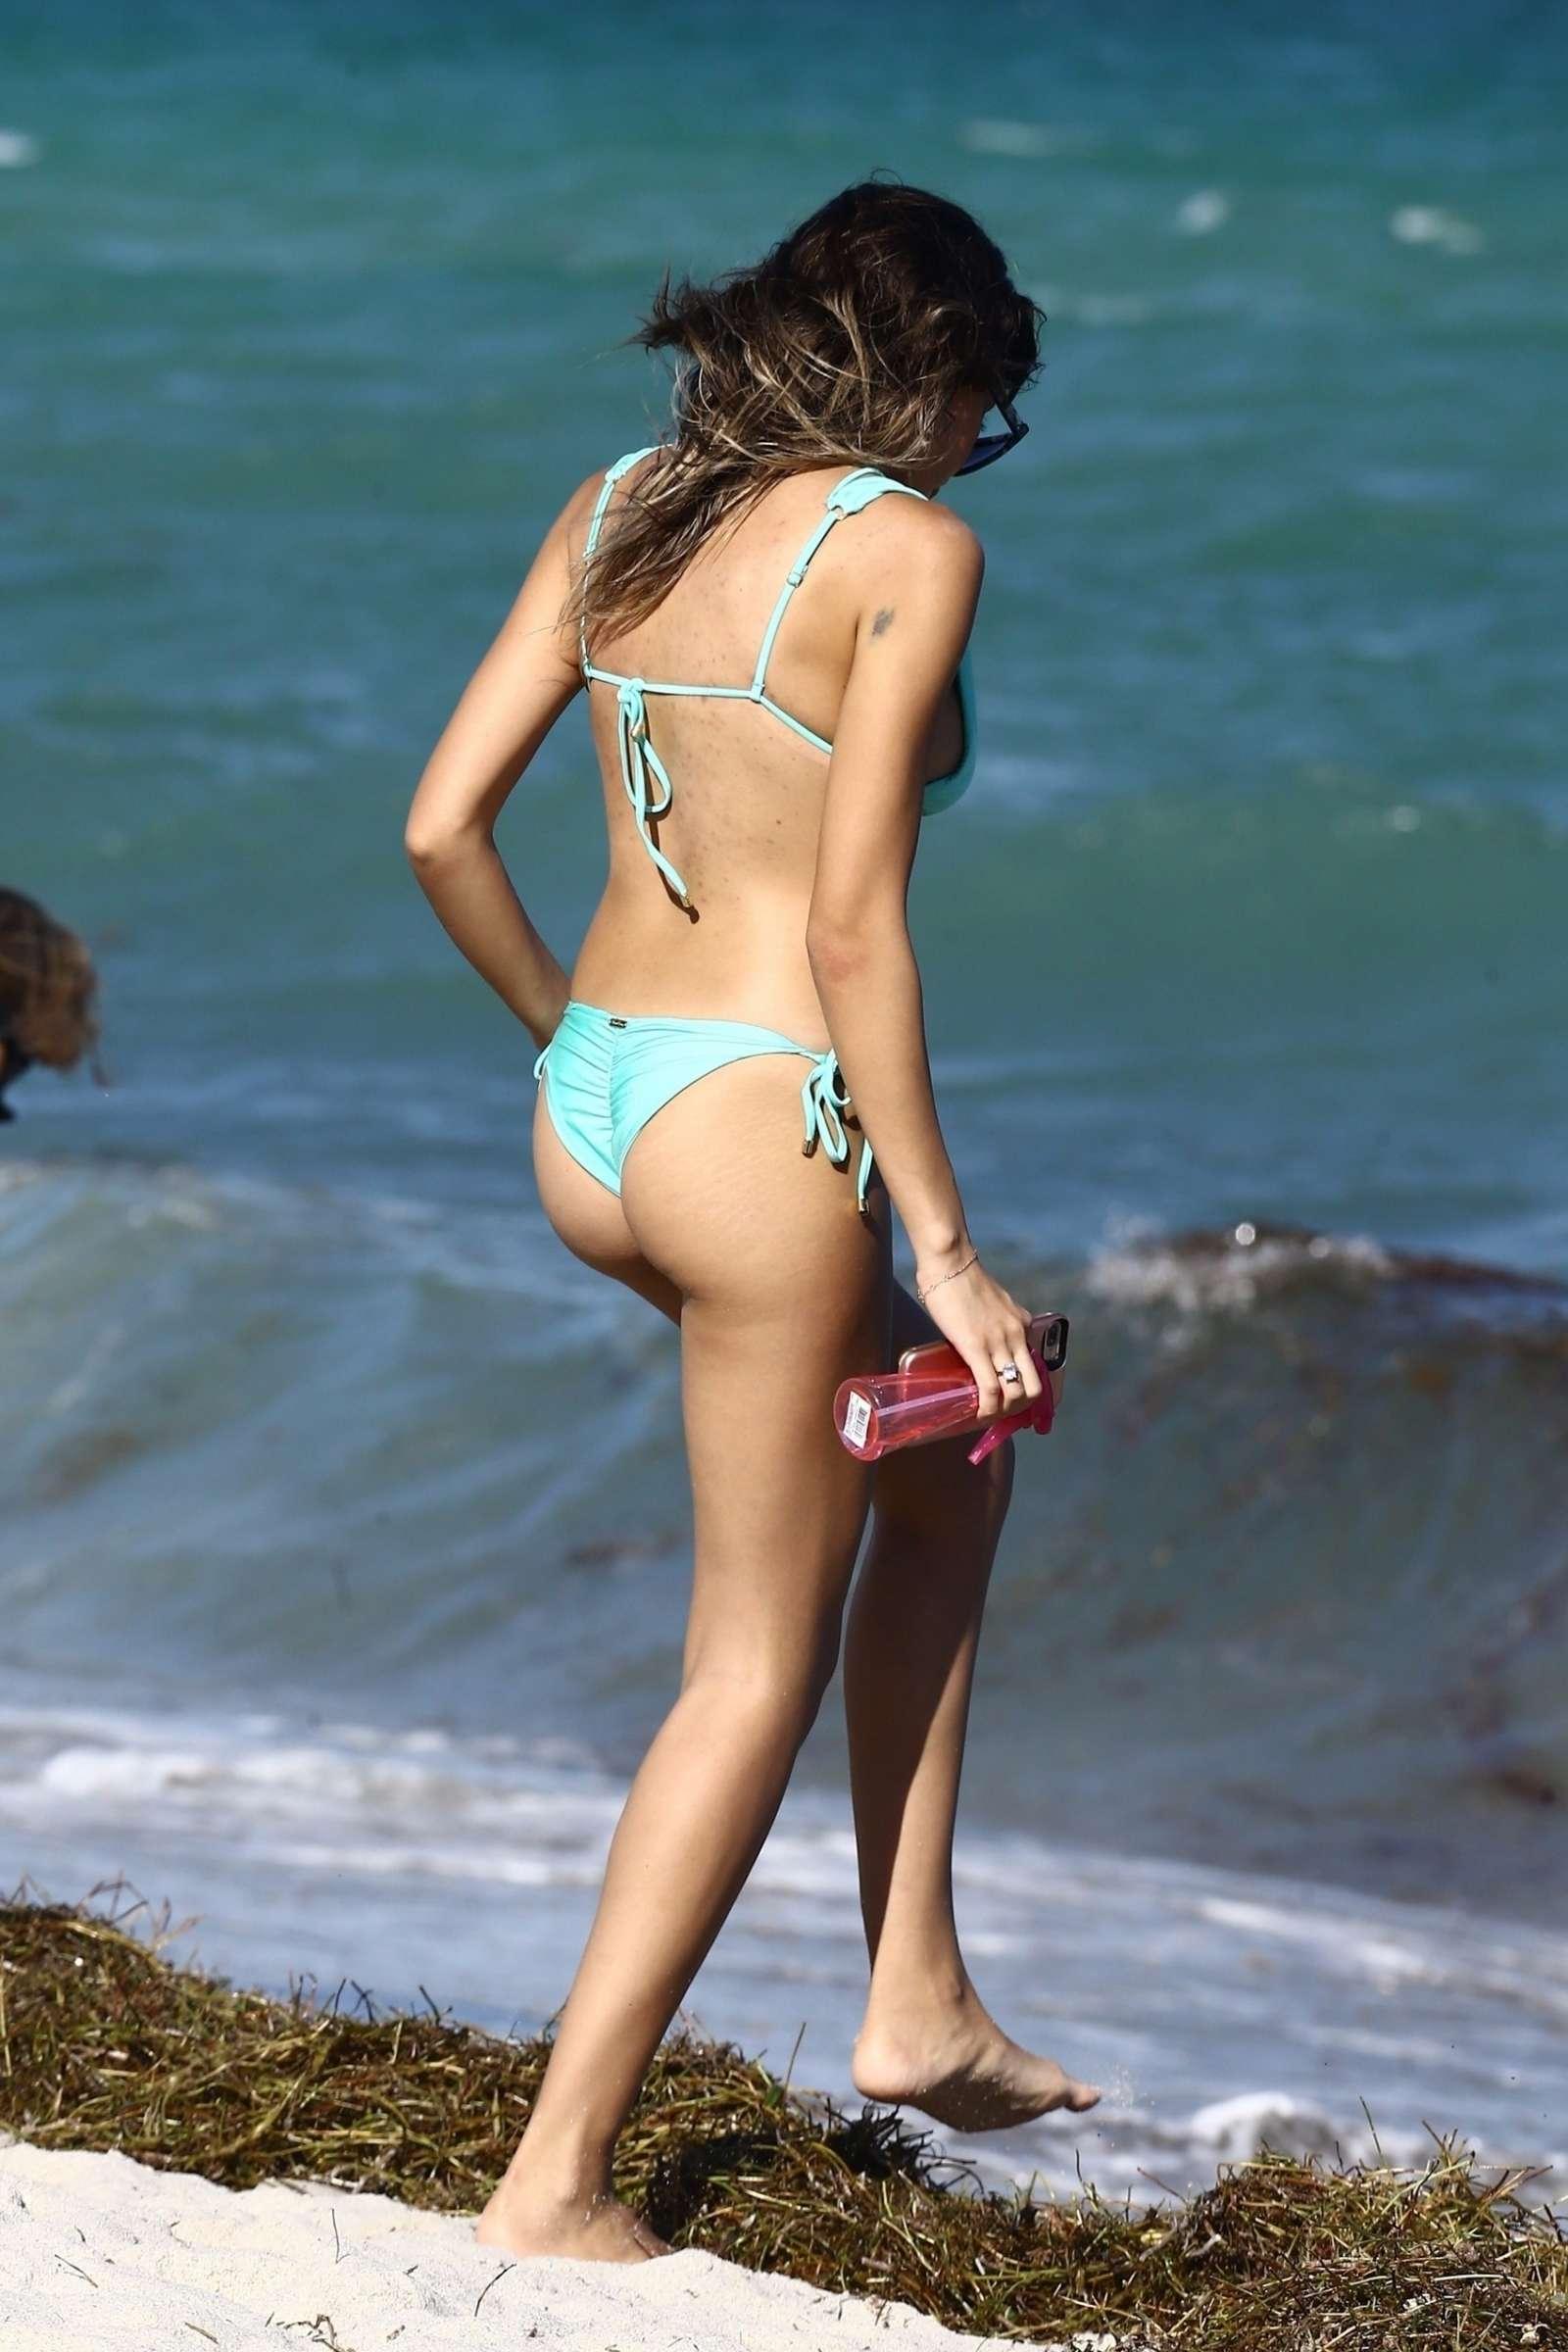 Bikini Jasmine Ferguson nudes (39 photos), Sexy, Cleavage, Feet, bra 2020